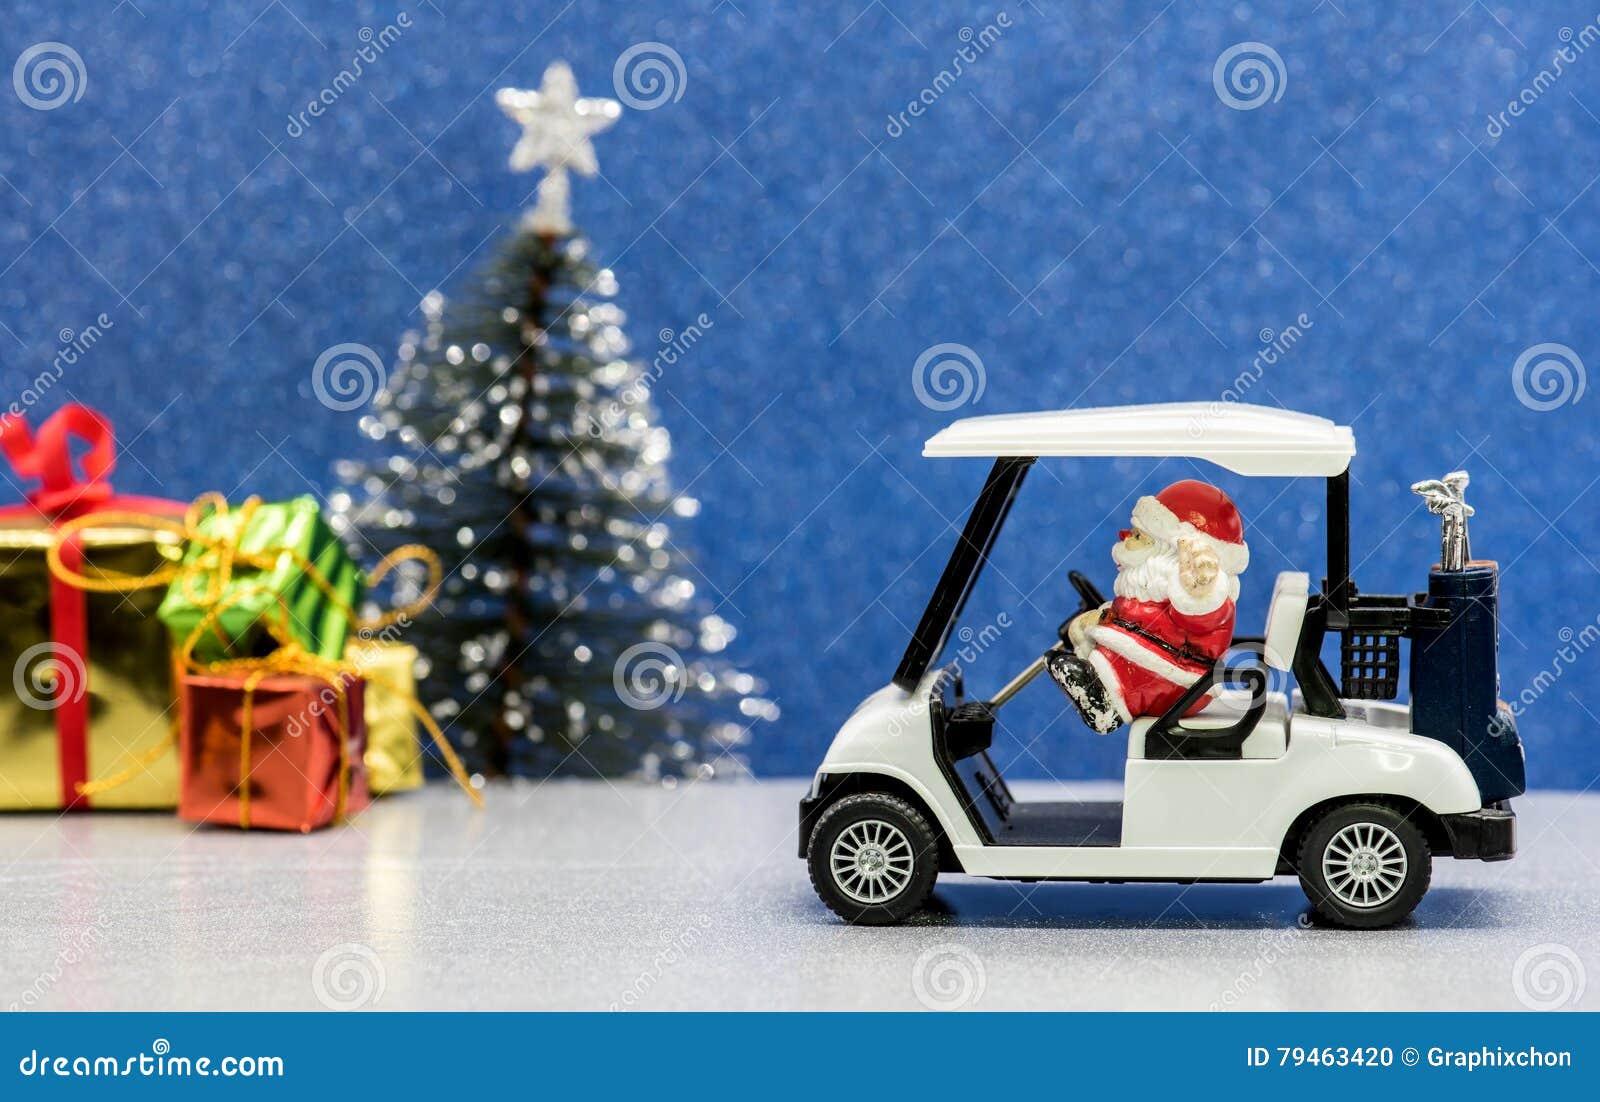 Golf Cart Christmas Decorations.Santa Driving Golf Car Christmas Party Stock Photo Image